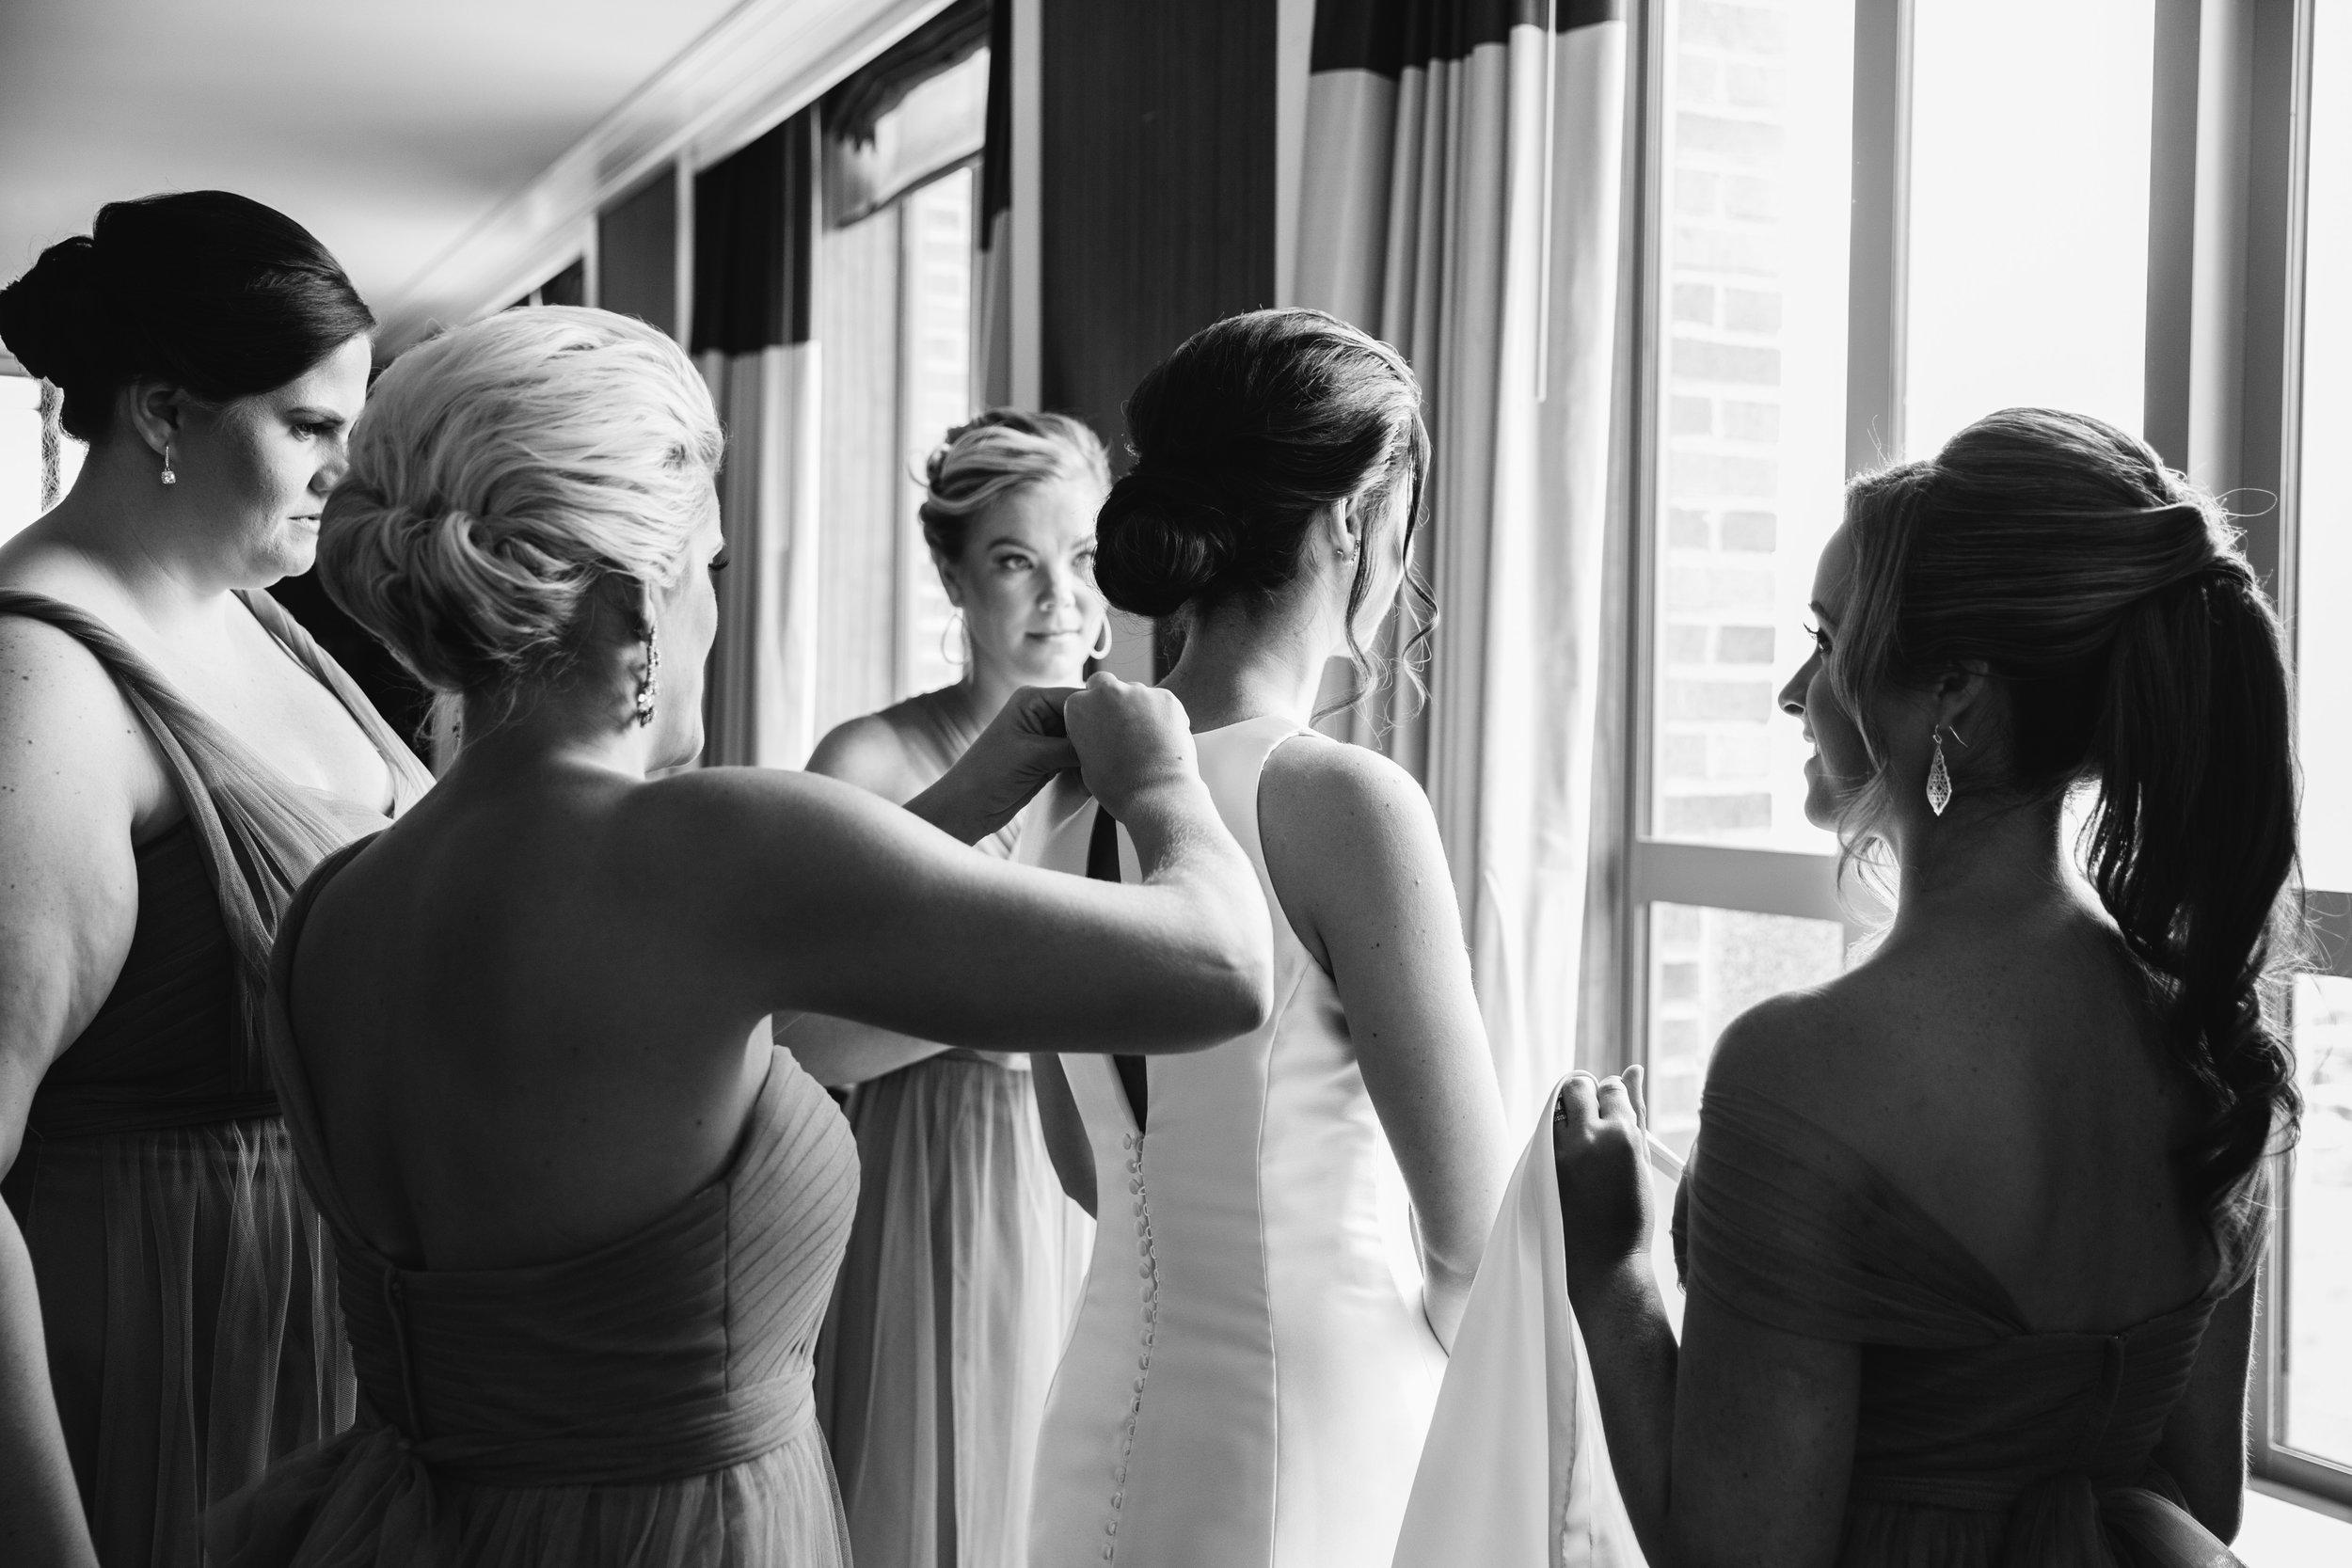 Hudson-Nichols-Black-Tie-Bride-Philadelphia-Waterworks-Wedding-Getting-Ready-Photos-11.jpg